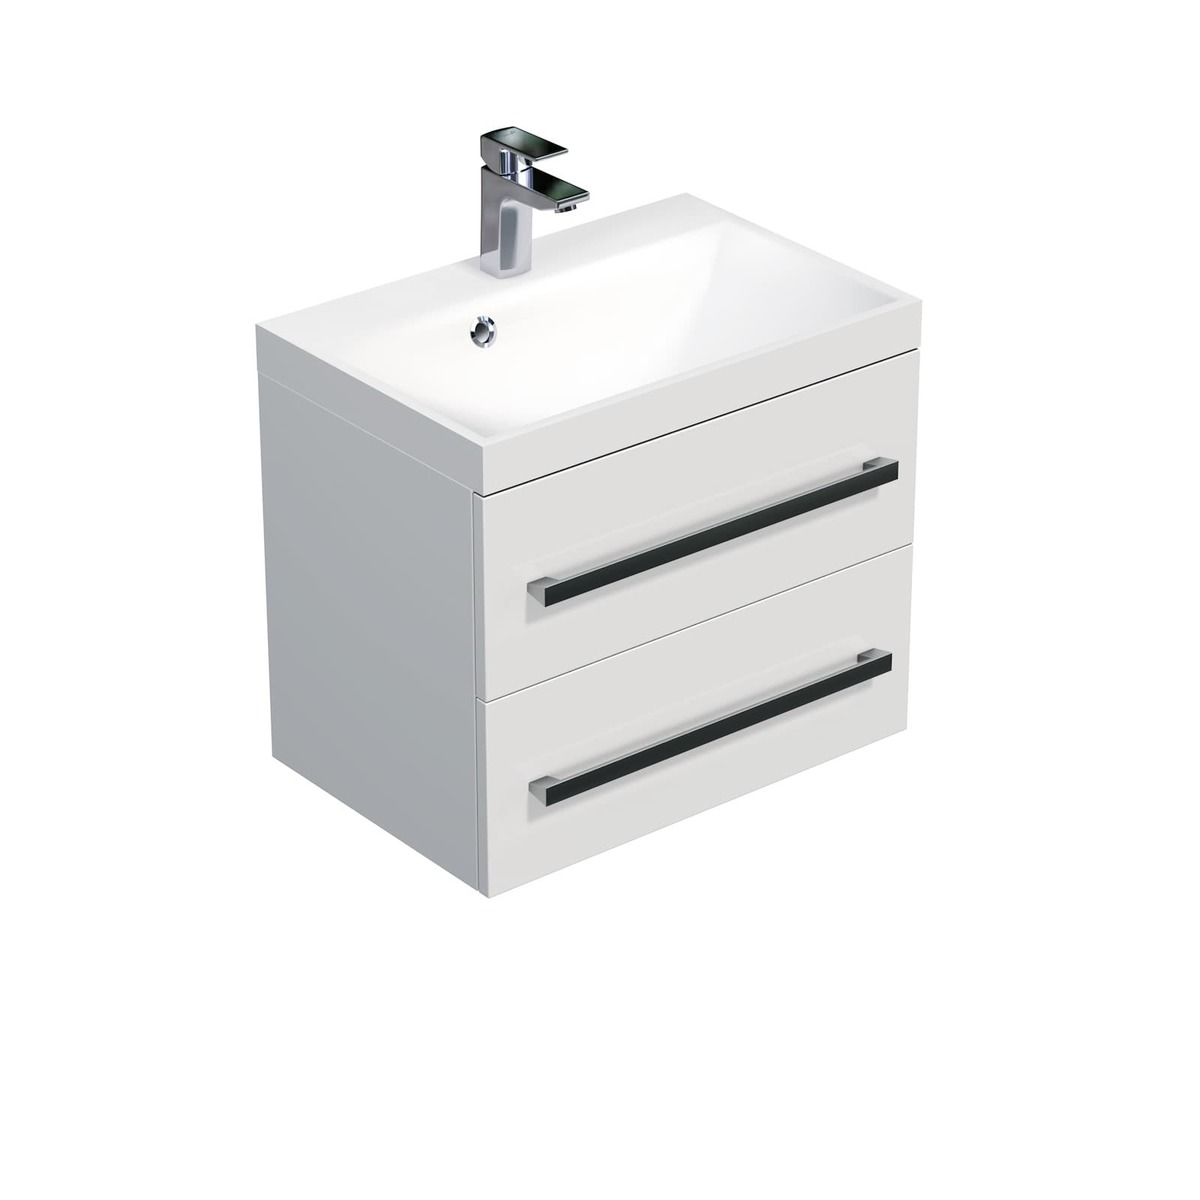 Koupelnová skříňka s umyvadlem Naturel Cube Way 60x40 cm bílá lesk CUBE260ZBL